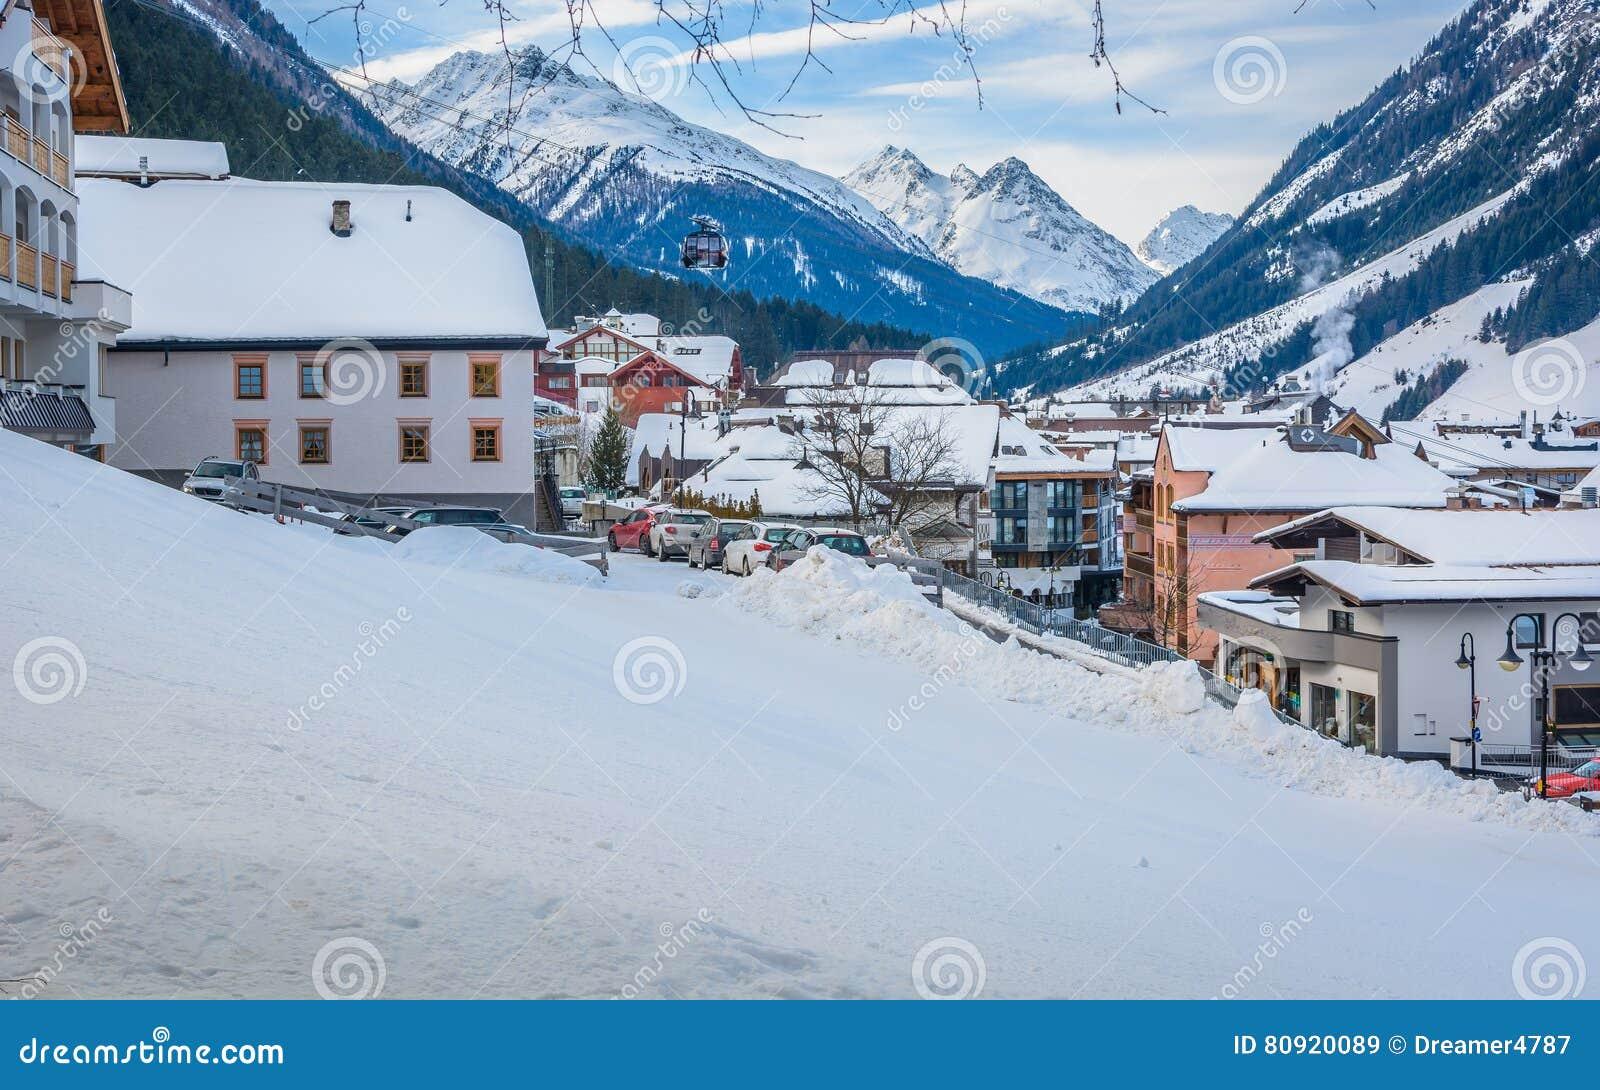 Ischgl skii resort in Austria, Europe.